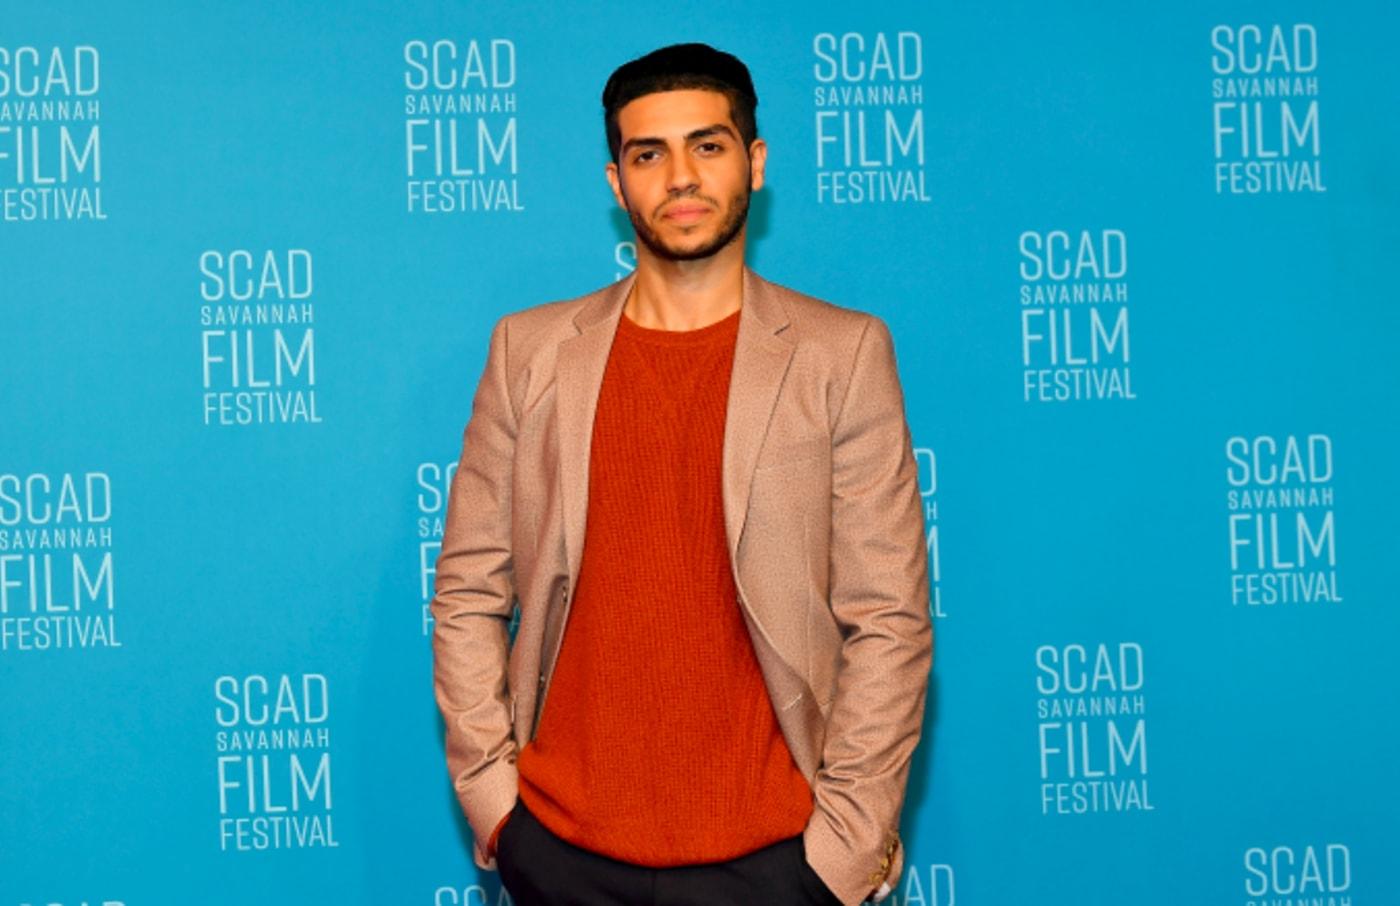 Actor Mena Massoud attends 22nd SCAD Savannah Film Festival